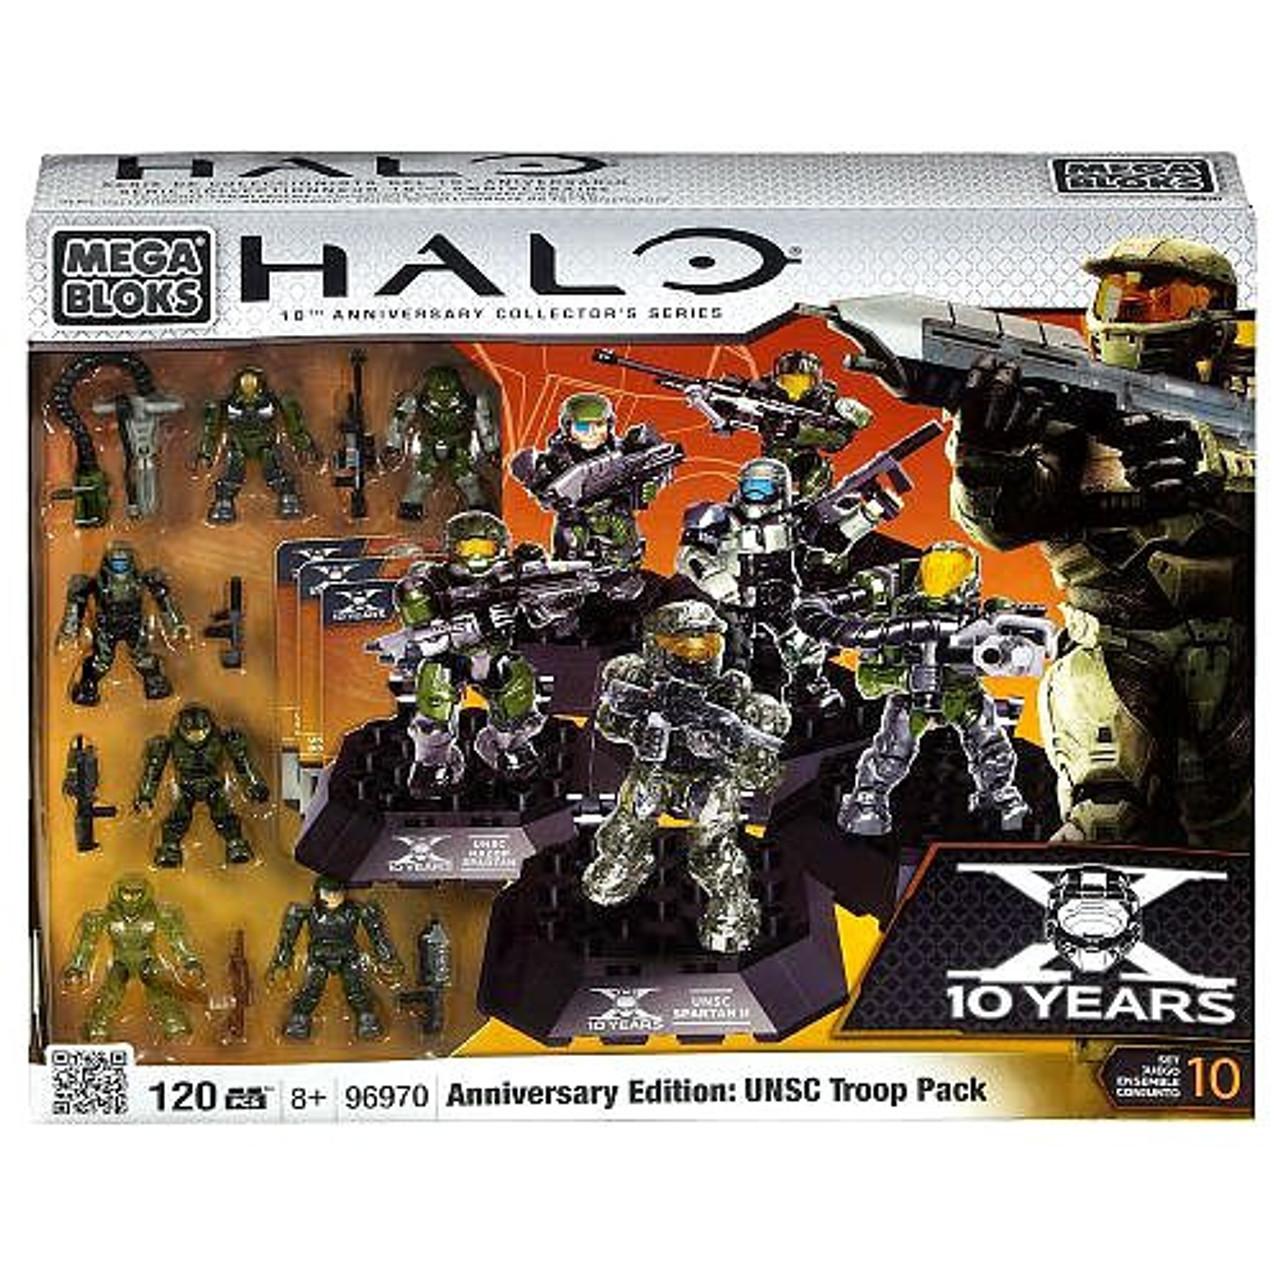 HALO Mega Bloks Collector/'s Edition Pack UNSC Spartan Air Assault